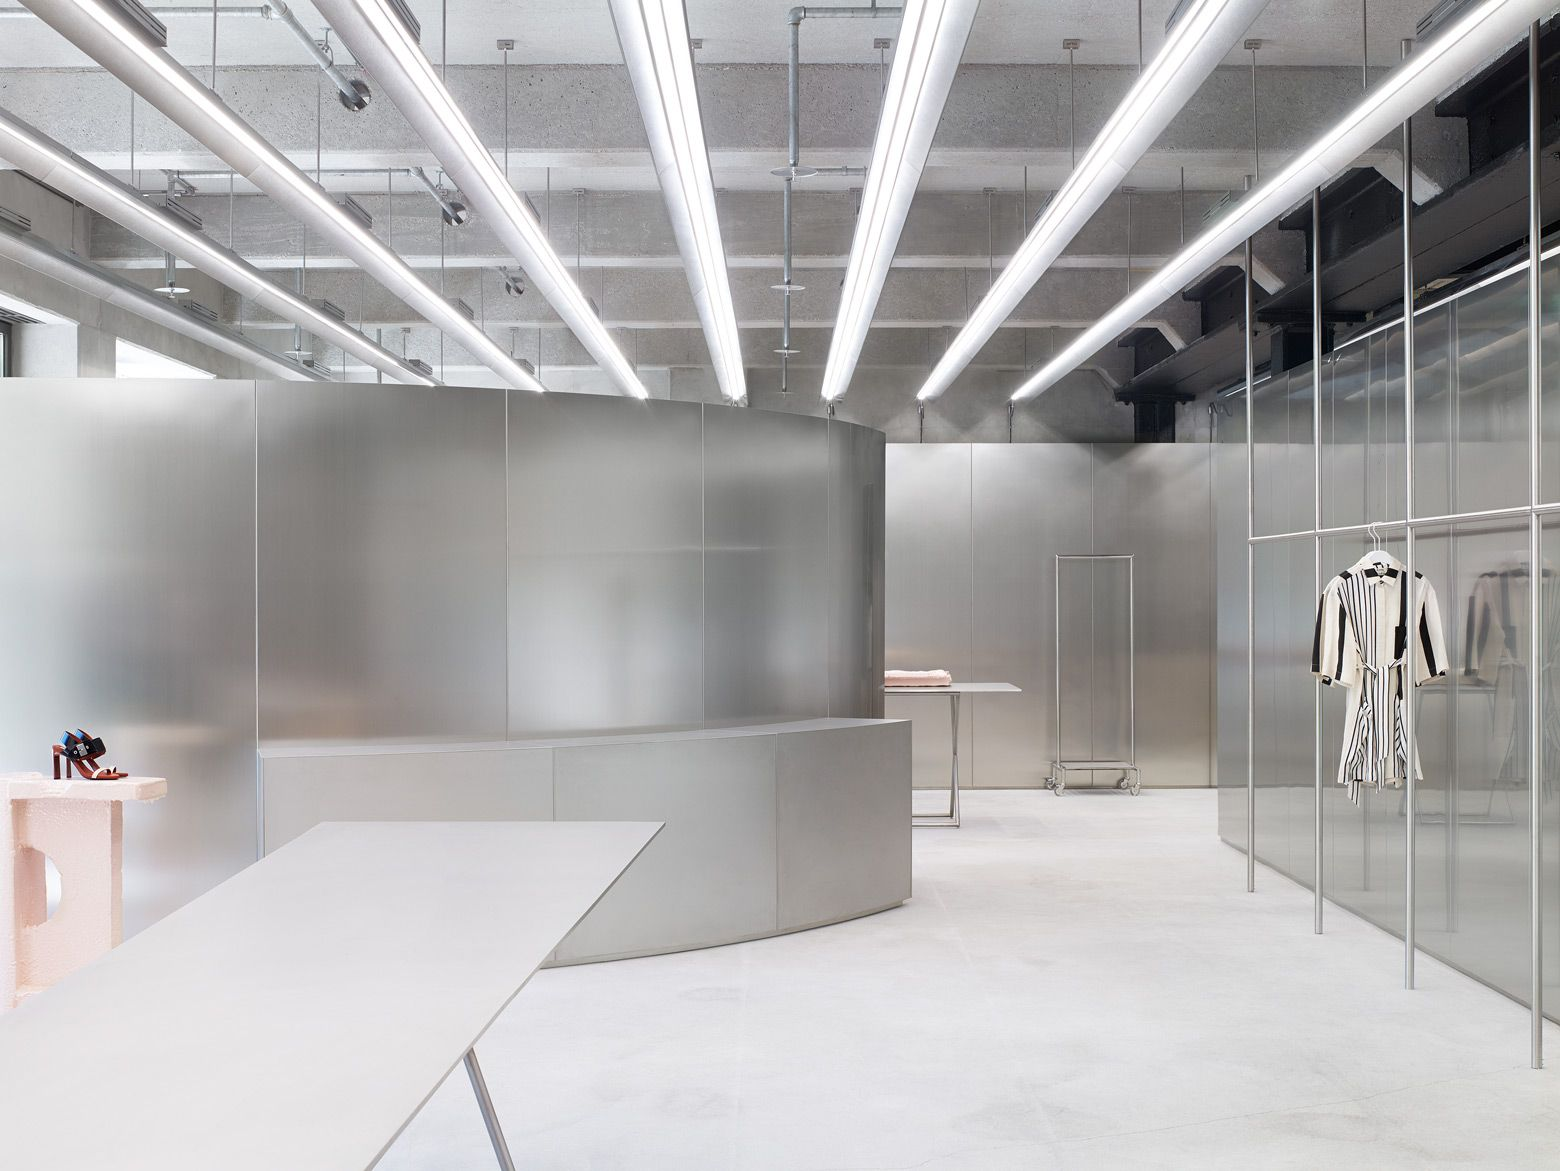 Acne Studios Maximiliansplatz Shop Ready To Wear Accessories Shoes And Denim For Men And Women Verkaufsdesign Produktdesign Studios